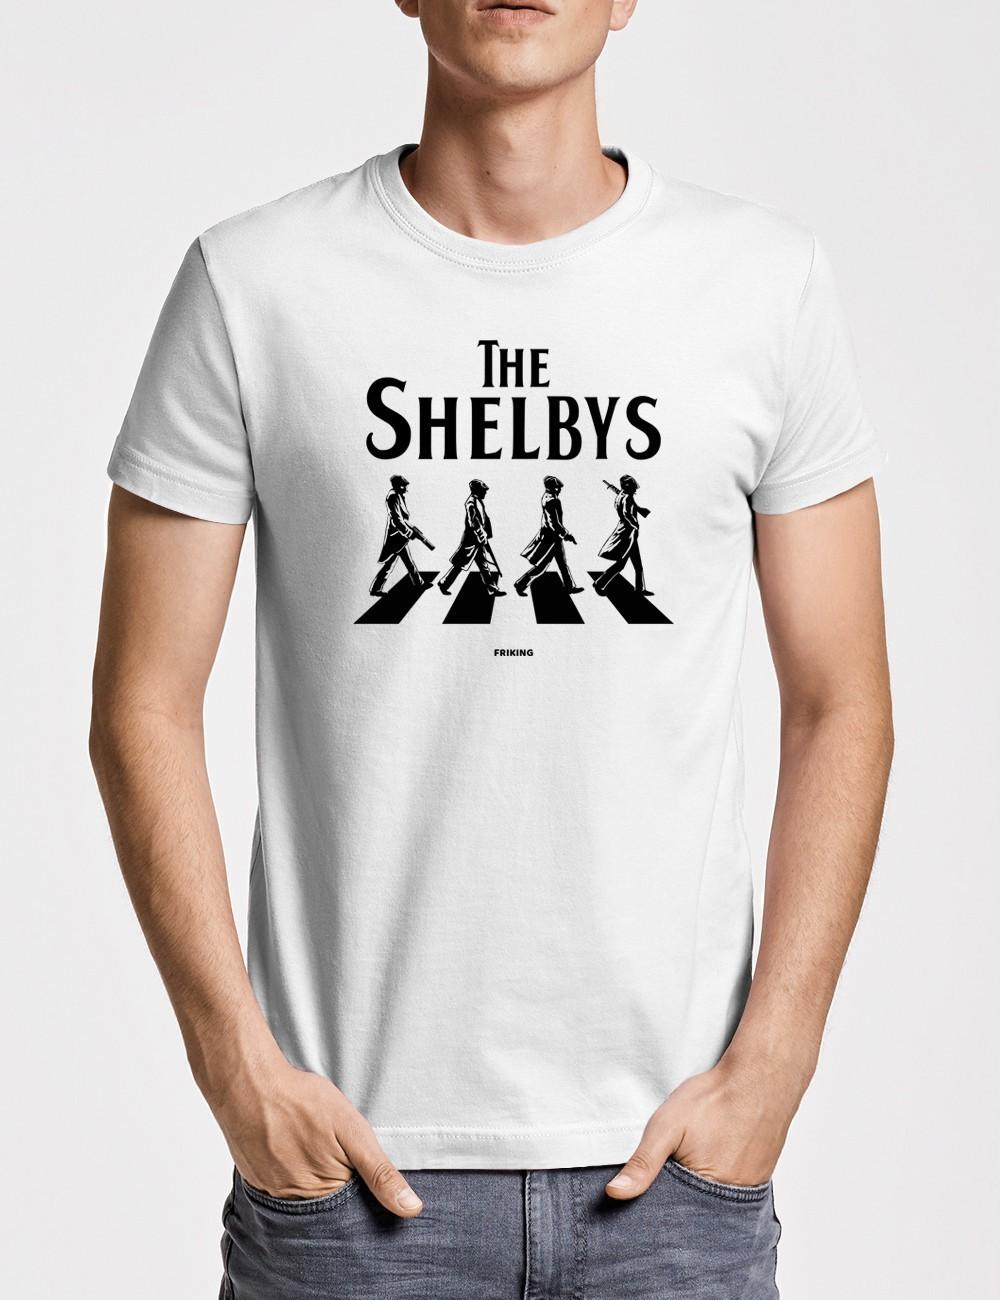 The Shelbys